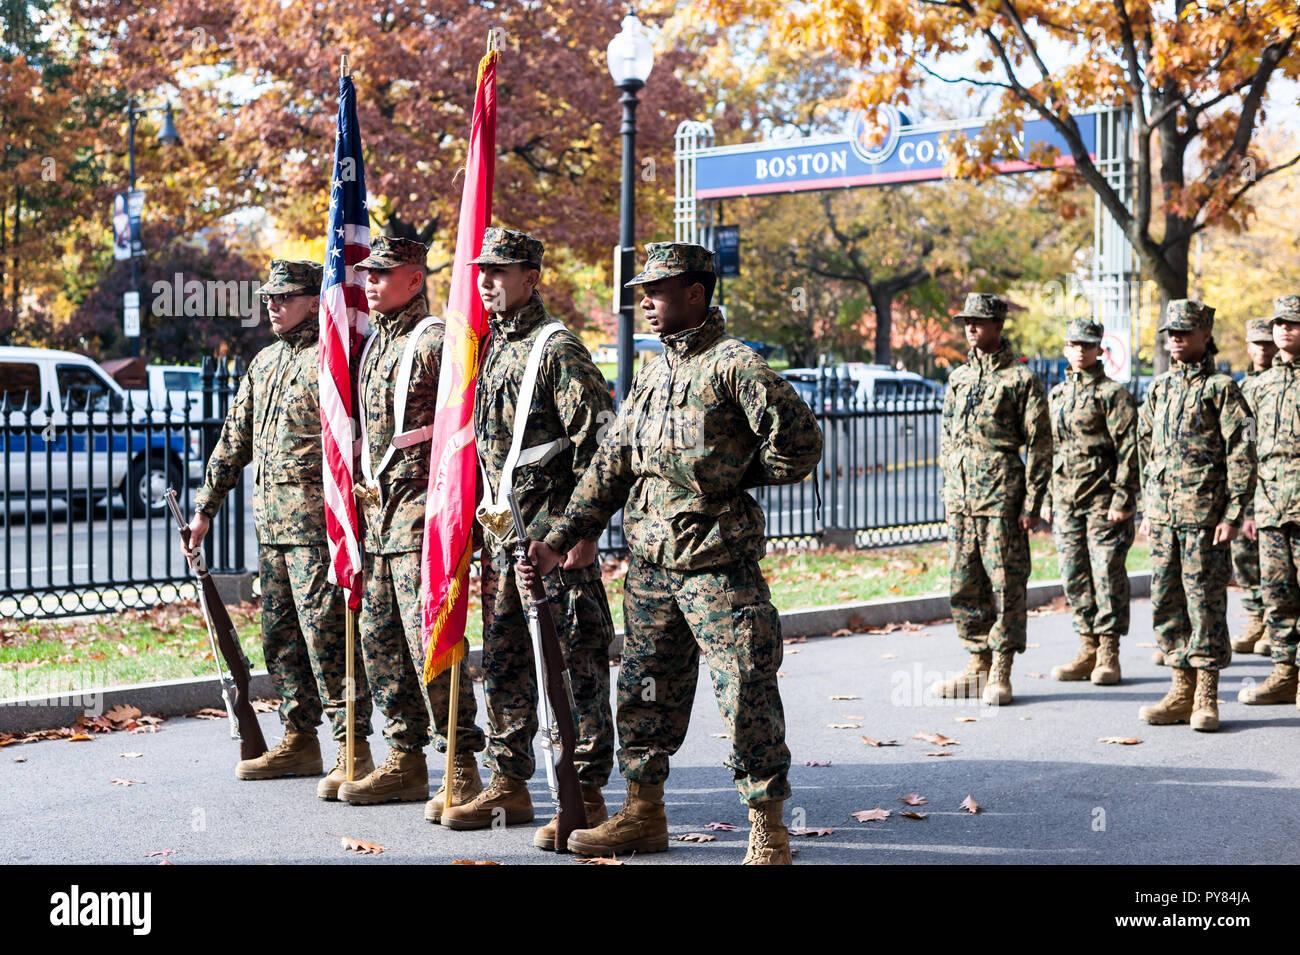 2015 Boston Veterans Day Parade at the Boston Public Garden - Stock Image